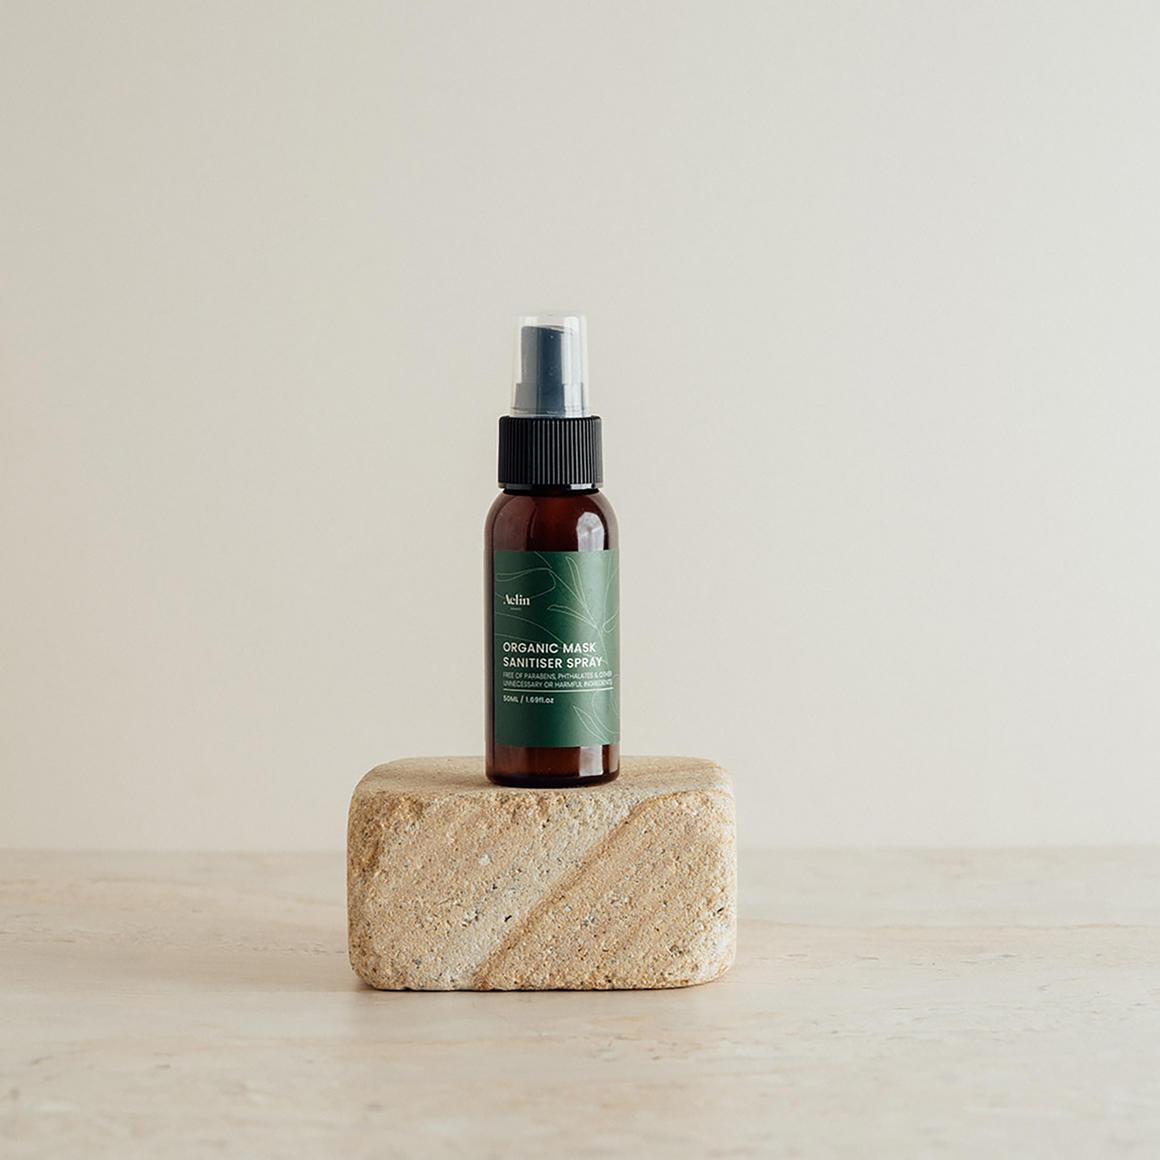 Organic Mask Sanitiser Spray - 50ml   Trada Marketplace